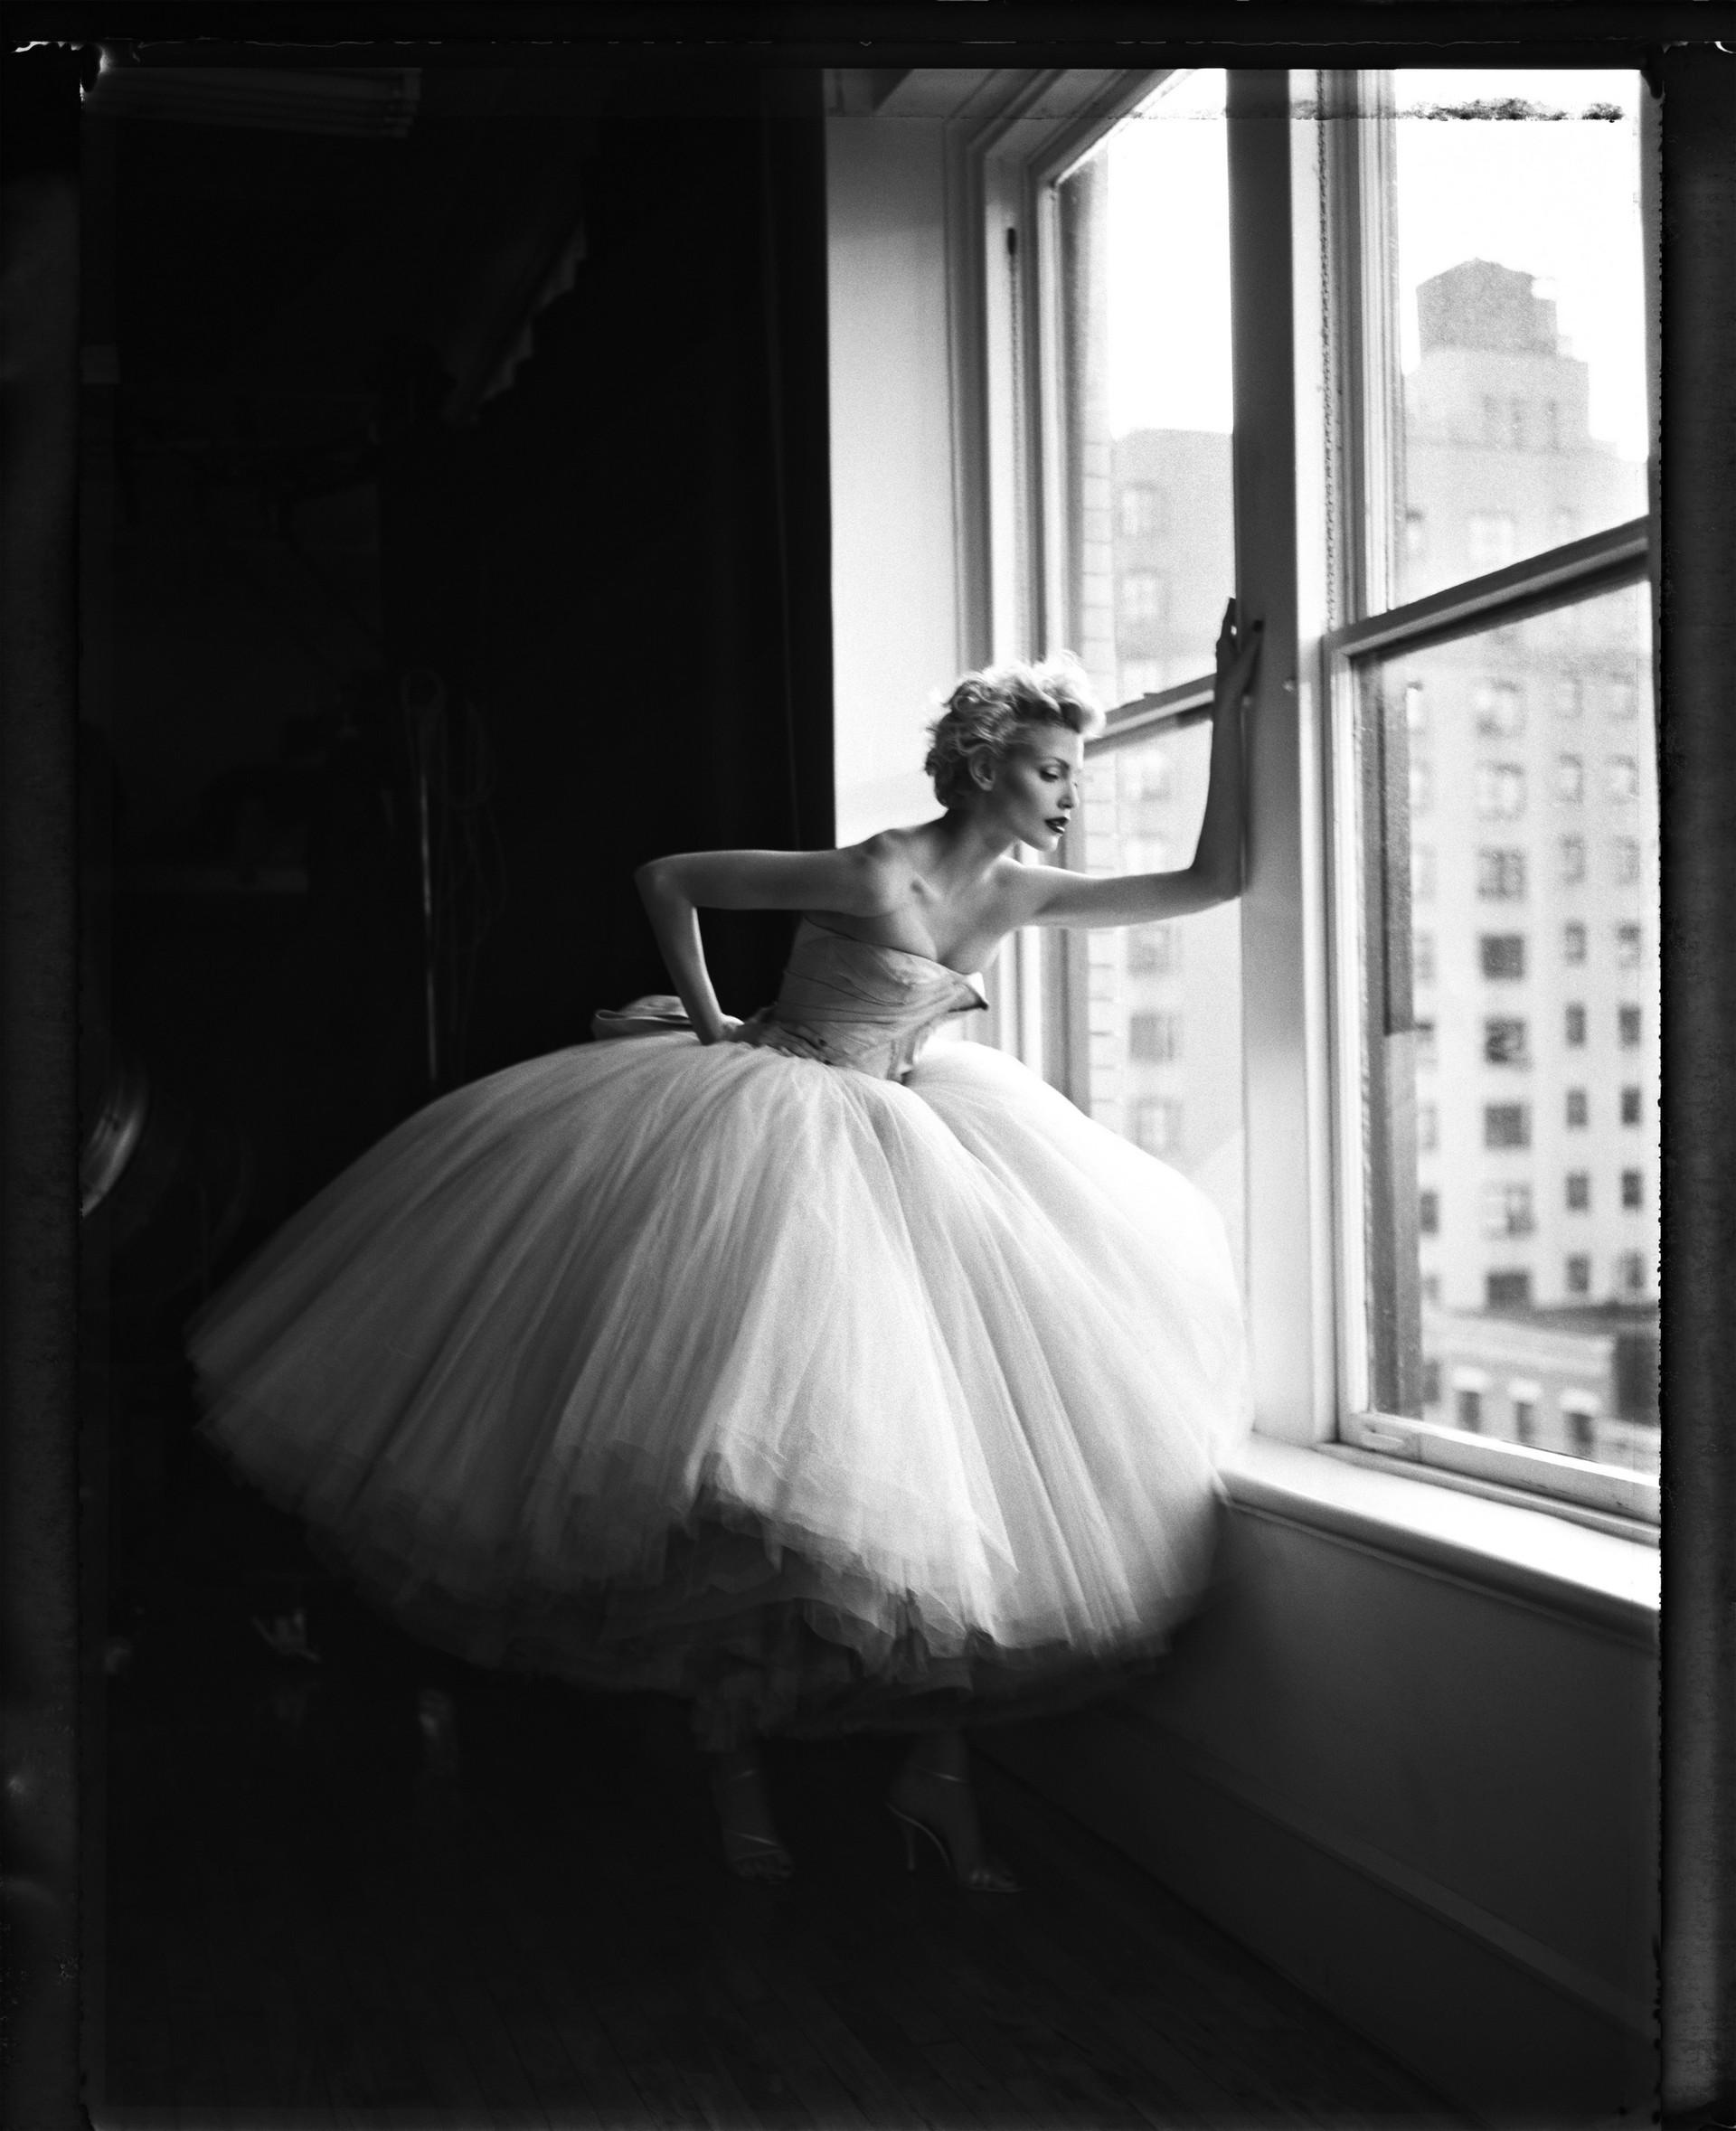 Надя Ауэрманн, Нью-Йорк, 1995. Фотограф Патрик Демаршелье